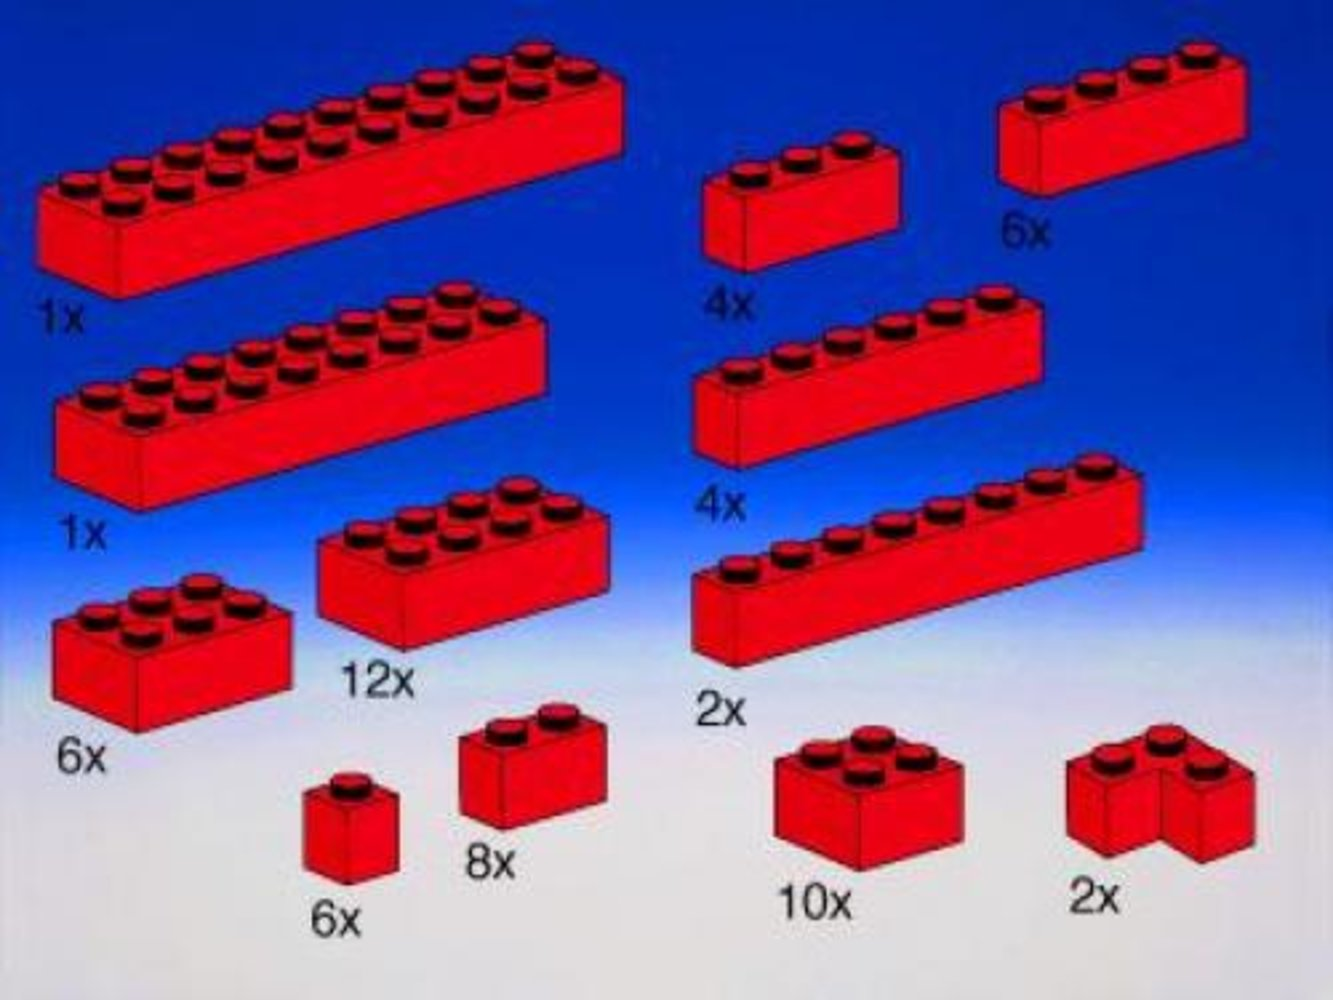 Extra Bricks in Red